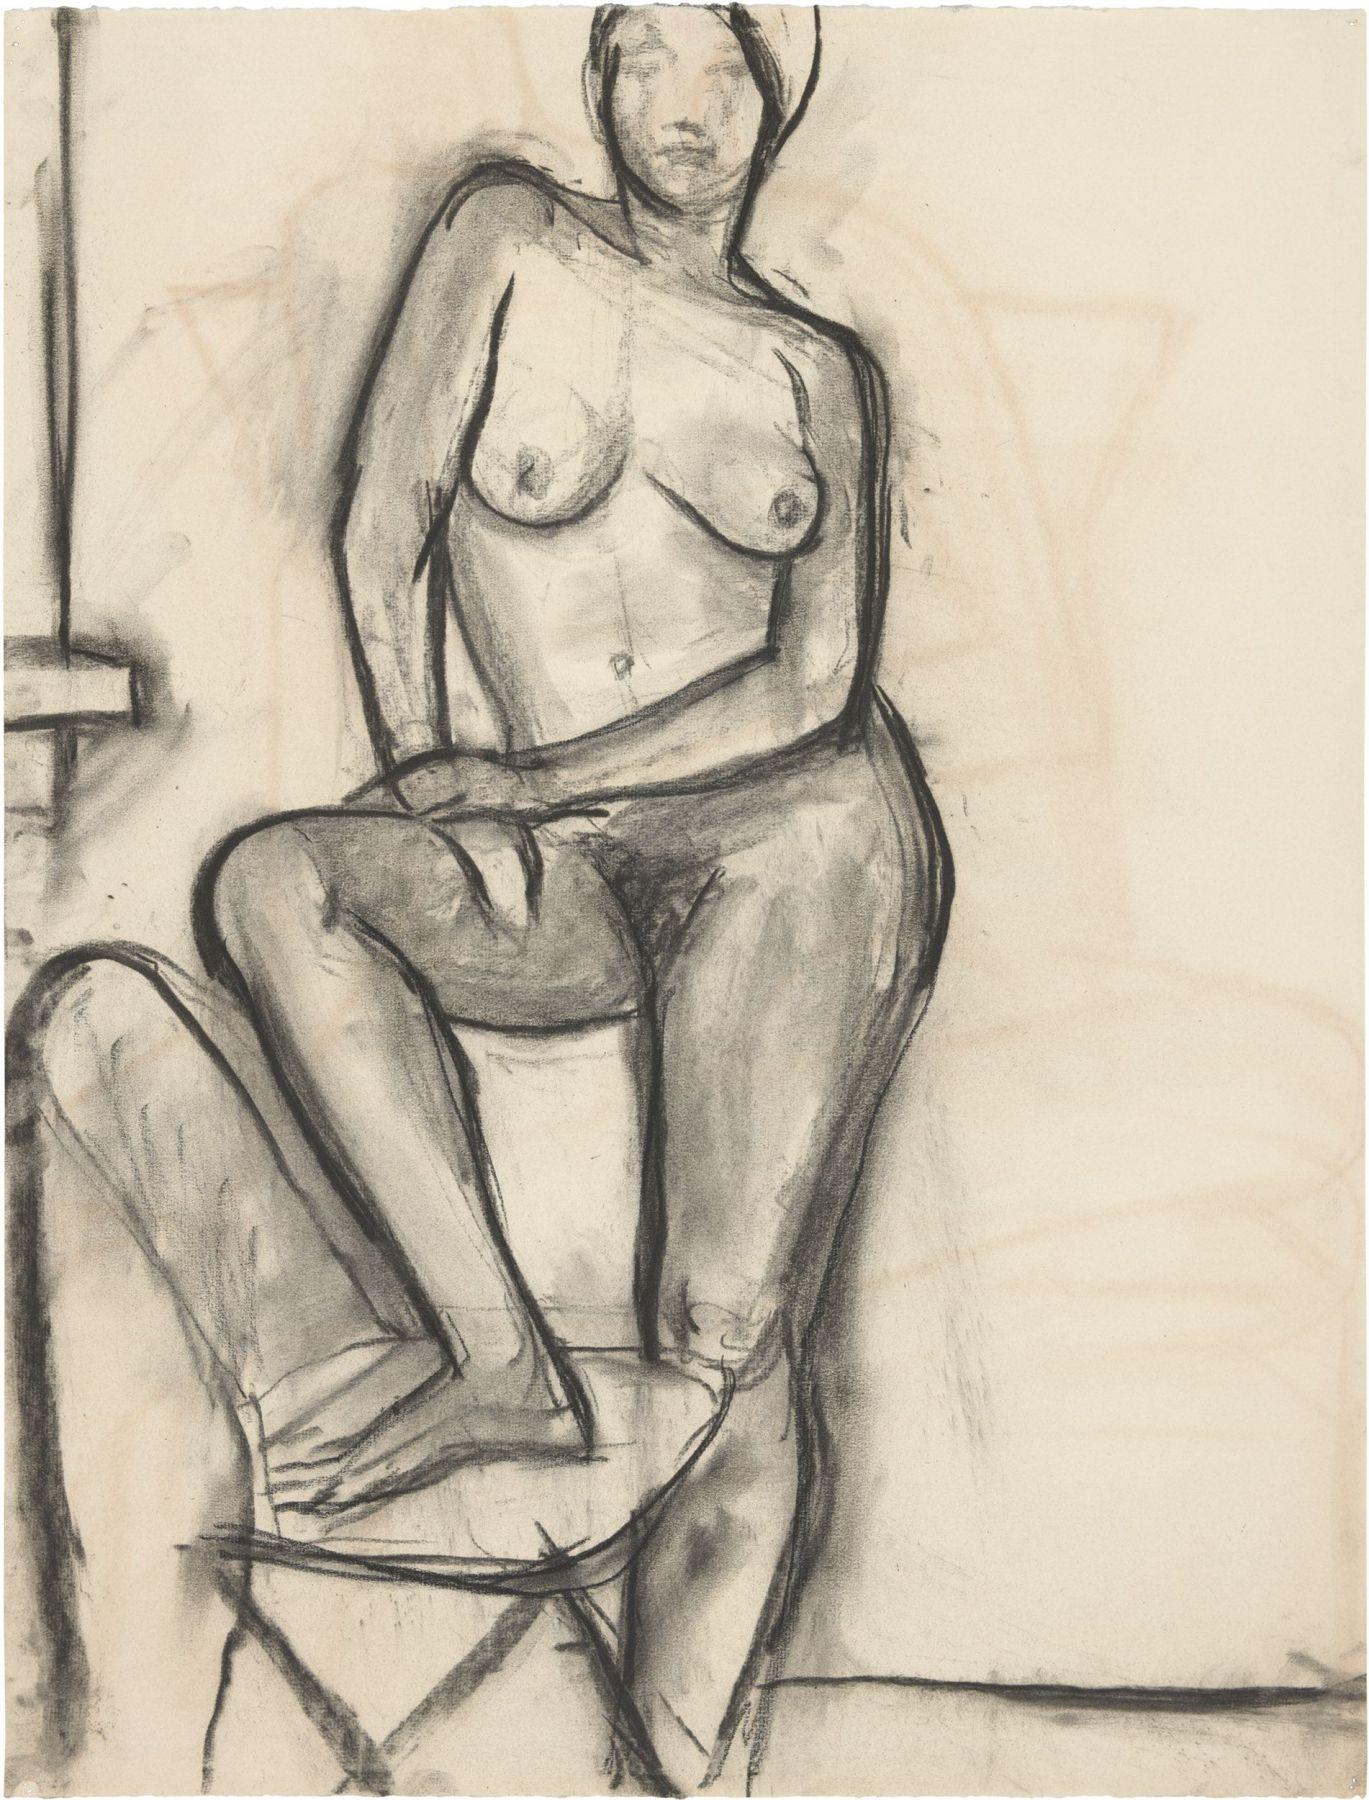 Untitled (CR no. 2886), c. 1960-66